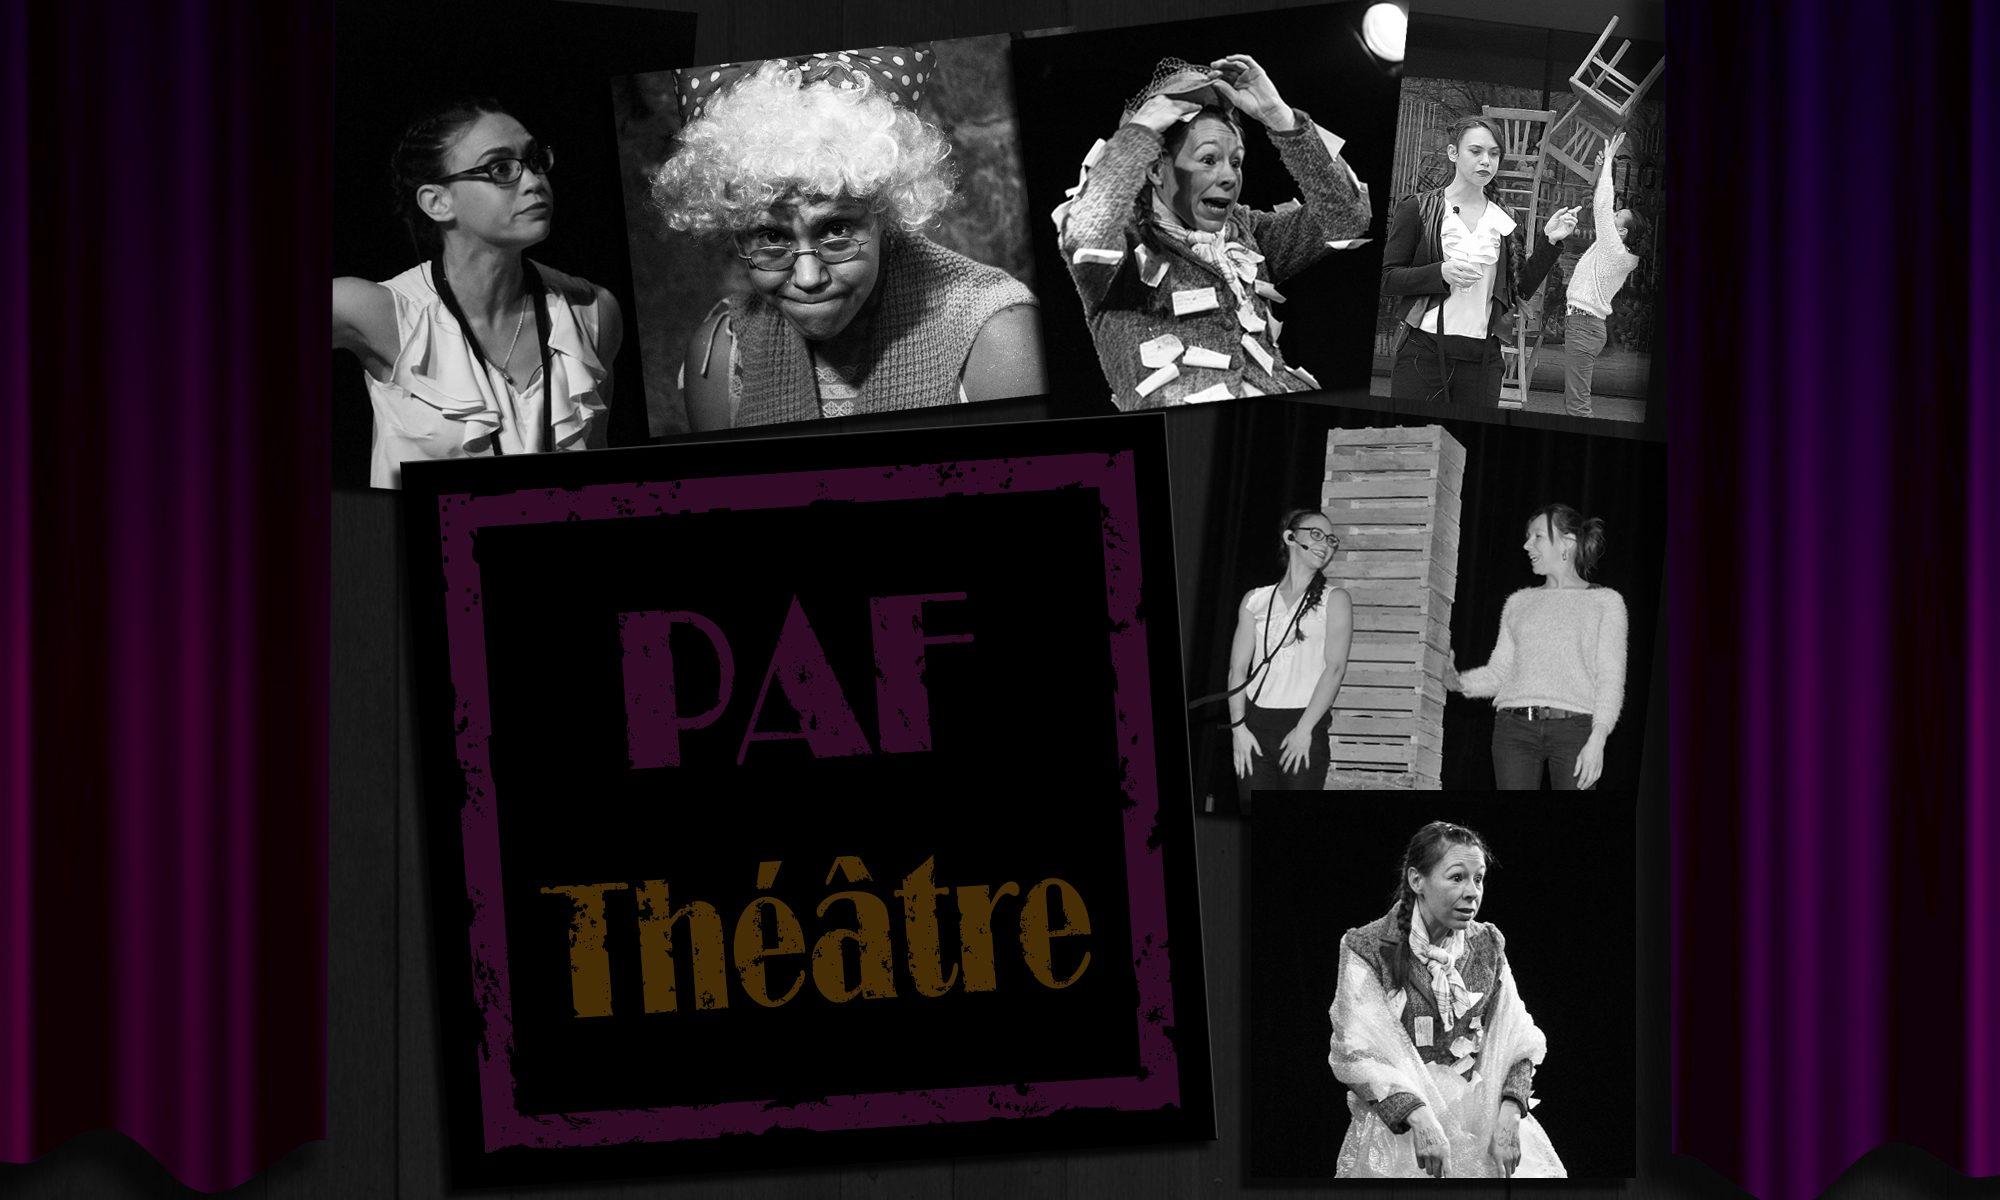 Paf Théâtre